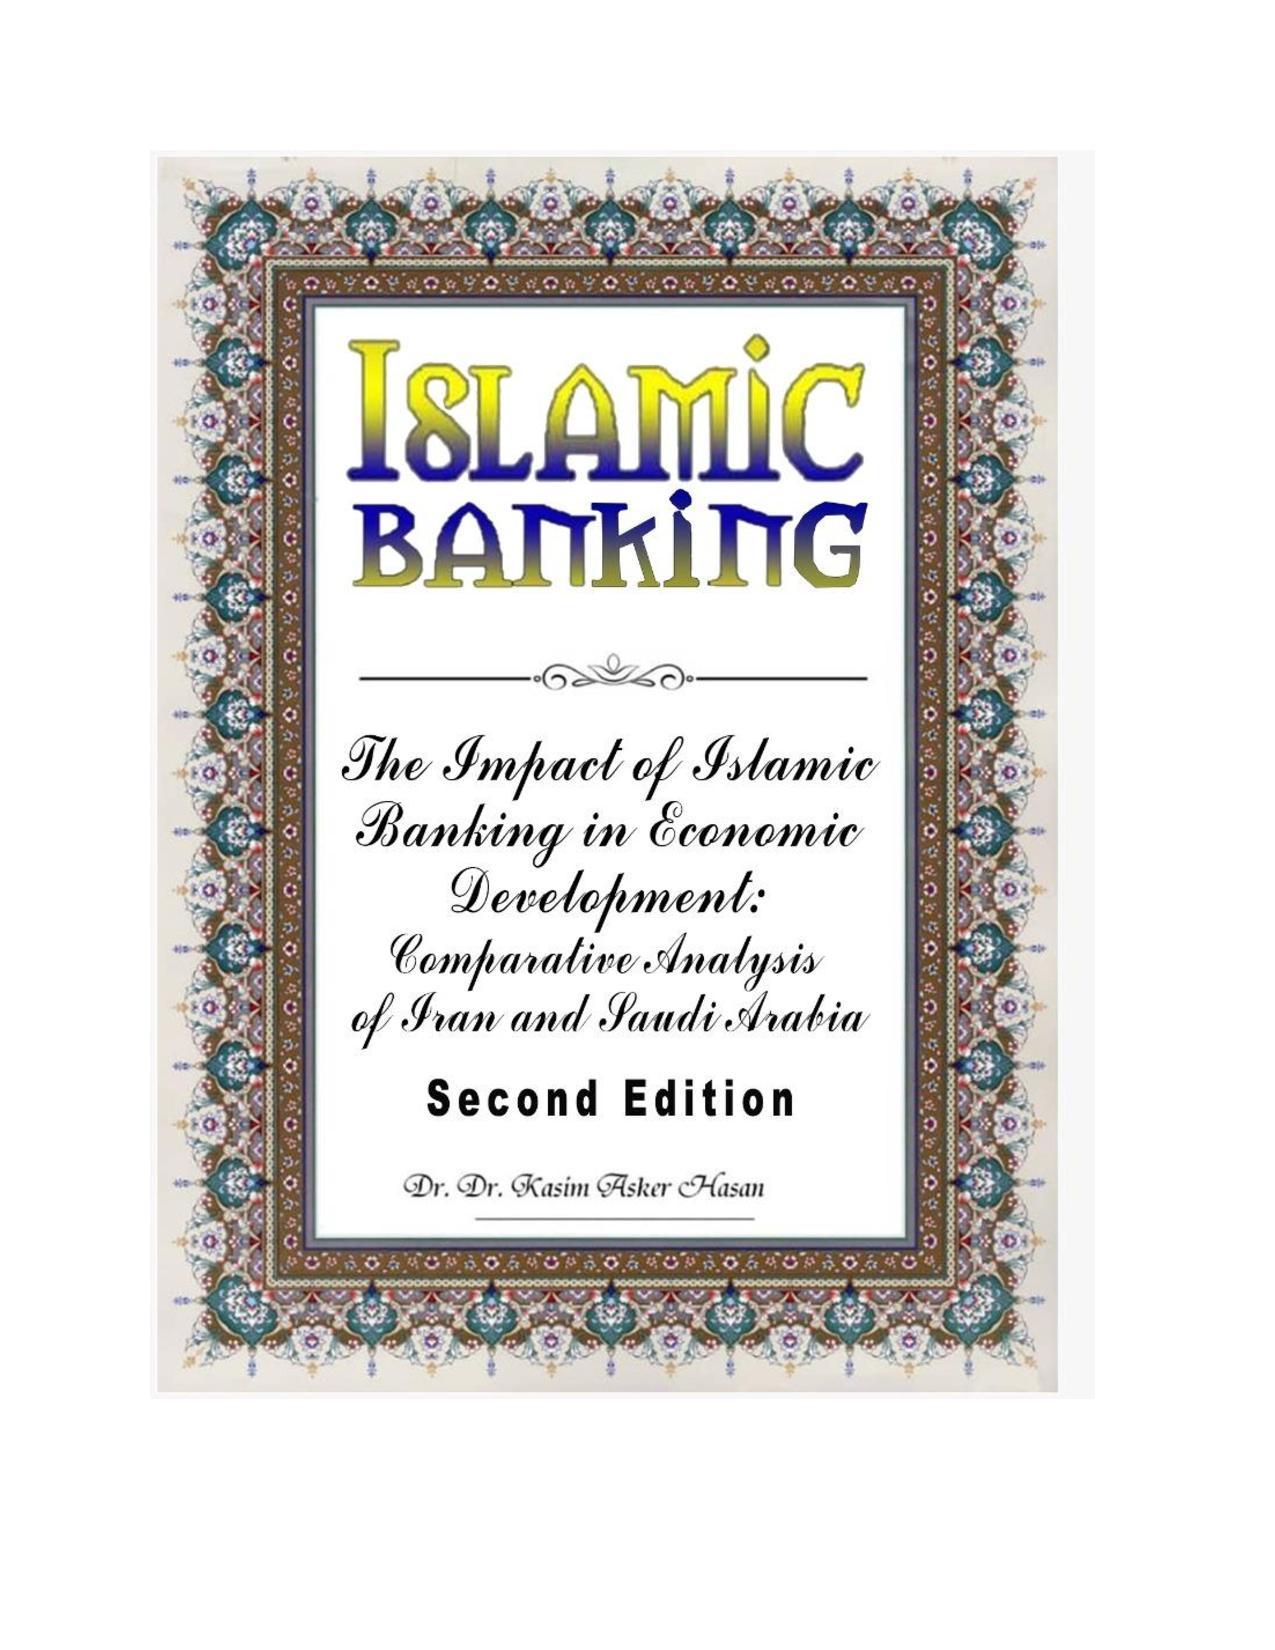 BANCA ISLÁMICA, del Embajador Kasim Asker Hasan, Segunda Edición Inglés disponible de manera gratuita